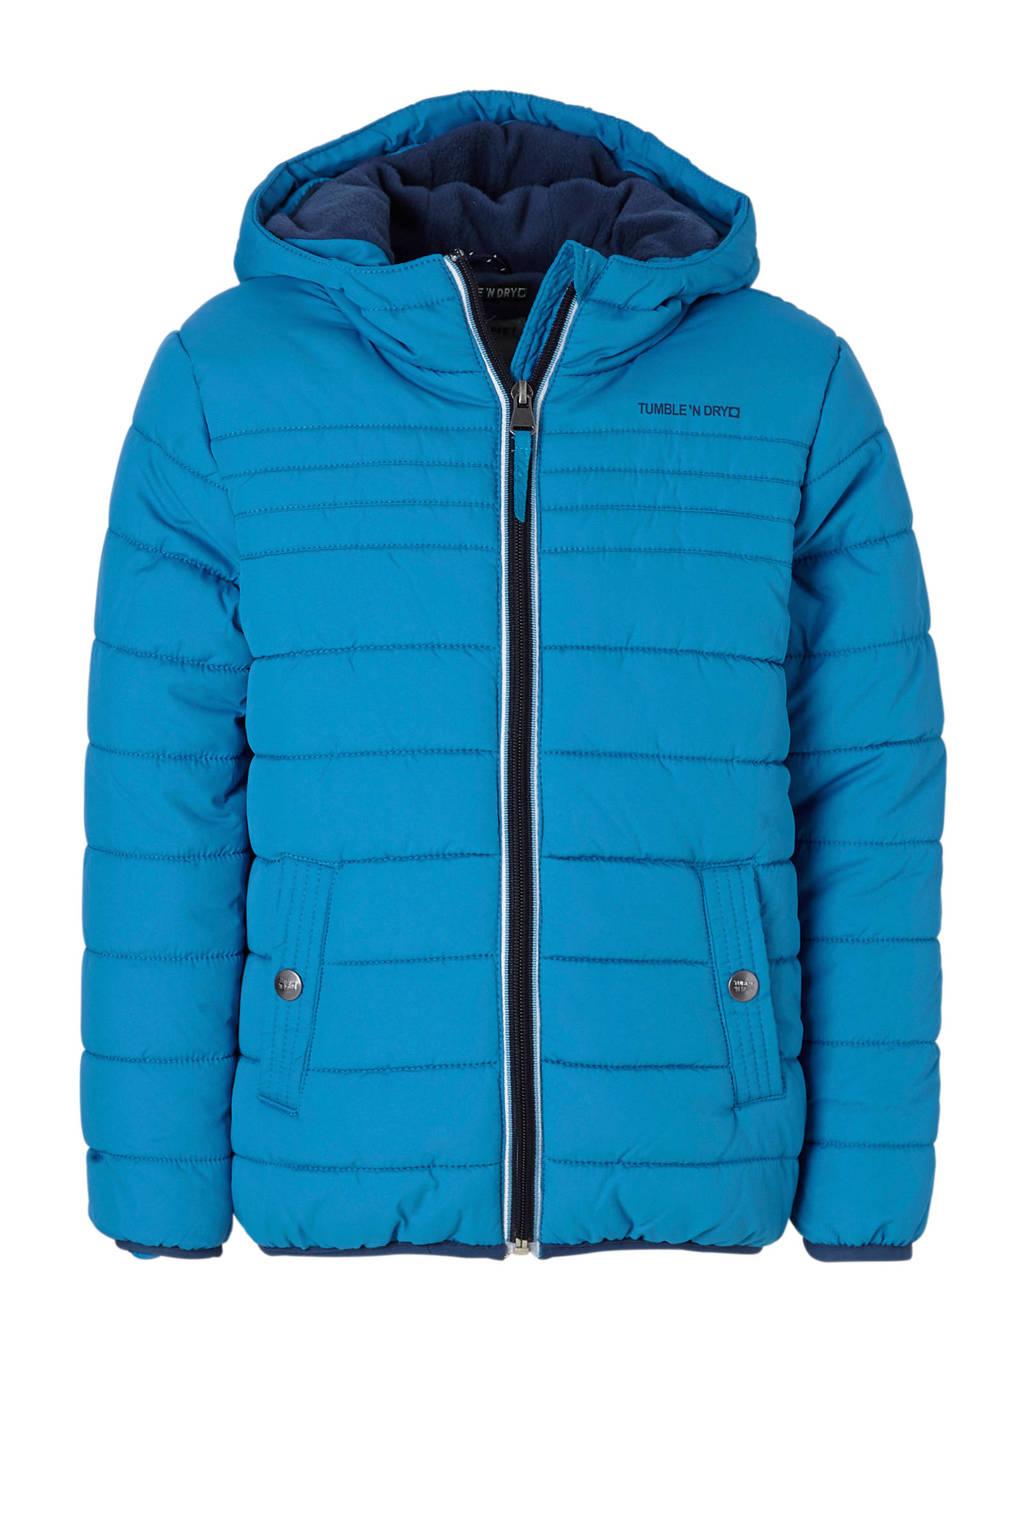 Tumble 'n Dry Mid winterjas Oak blauw, Blauw